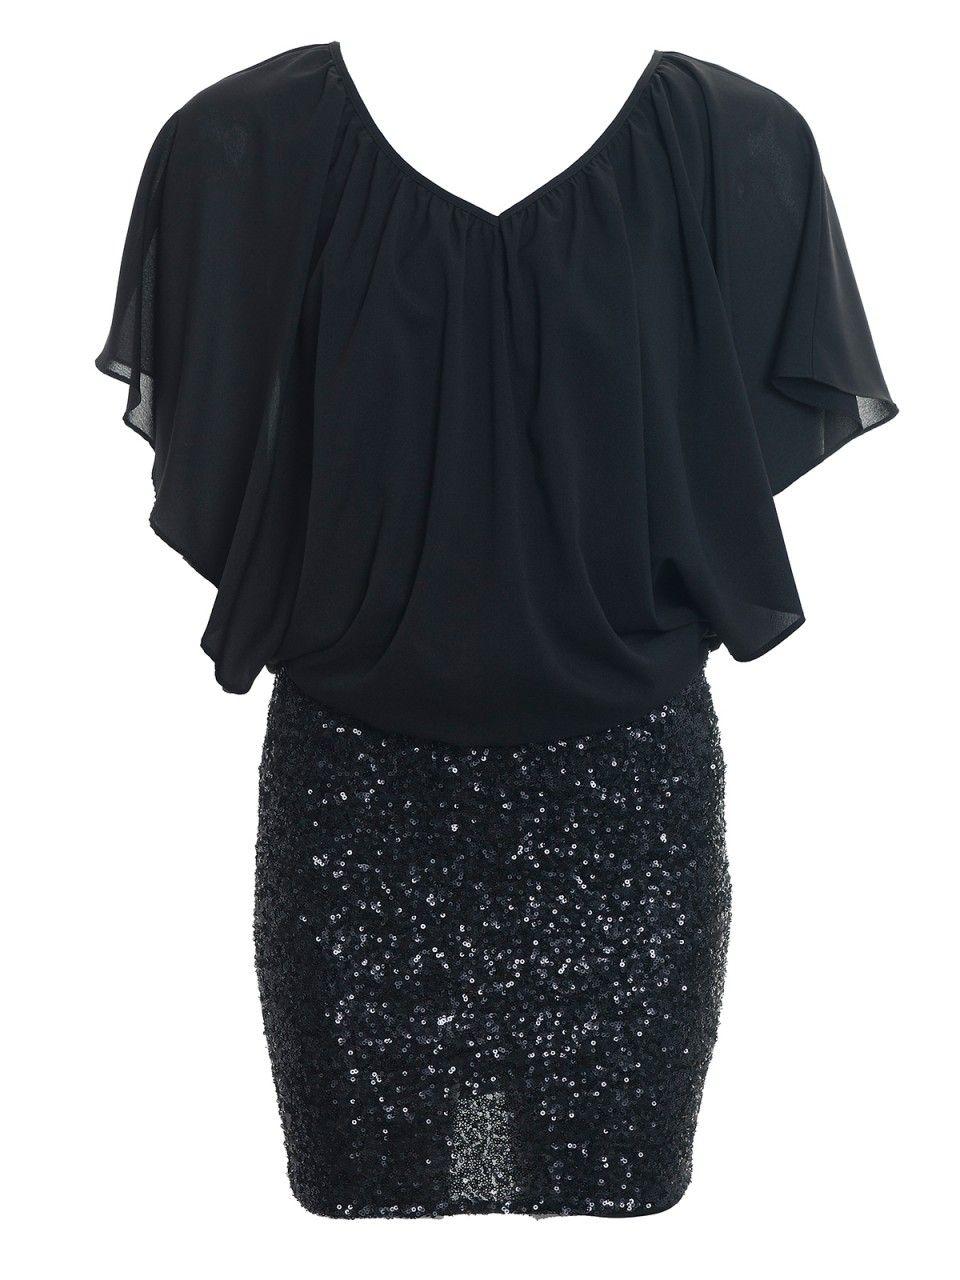 Adelphi Black/Black Sequin Tunic